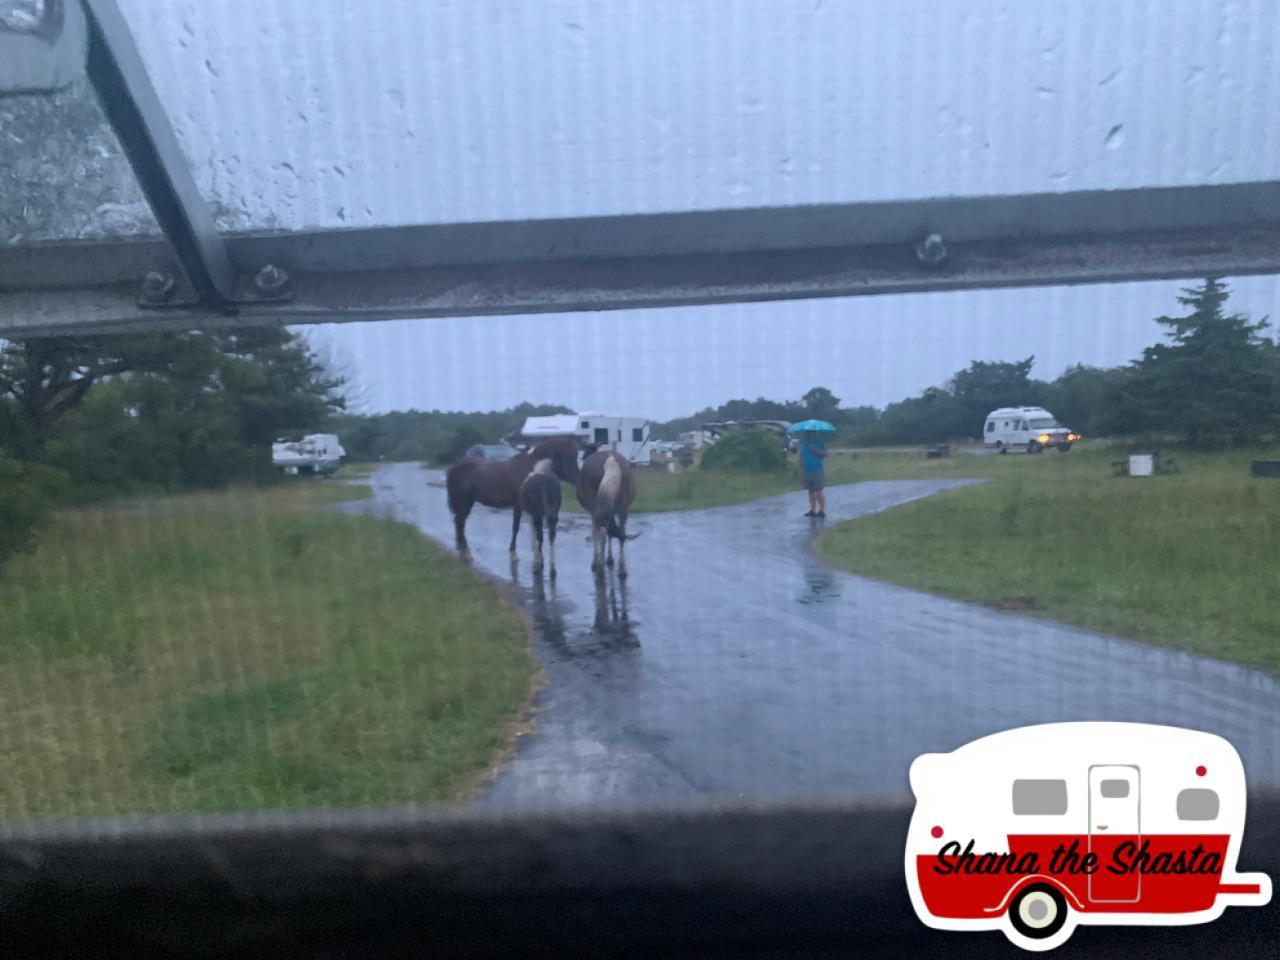 Navigating-Aggressive-Wild-Horses-on-Assateague